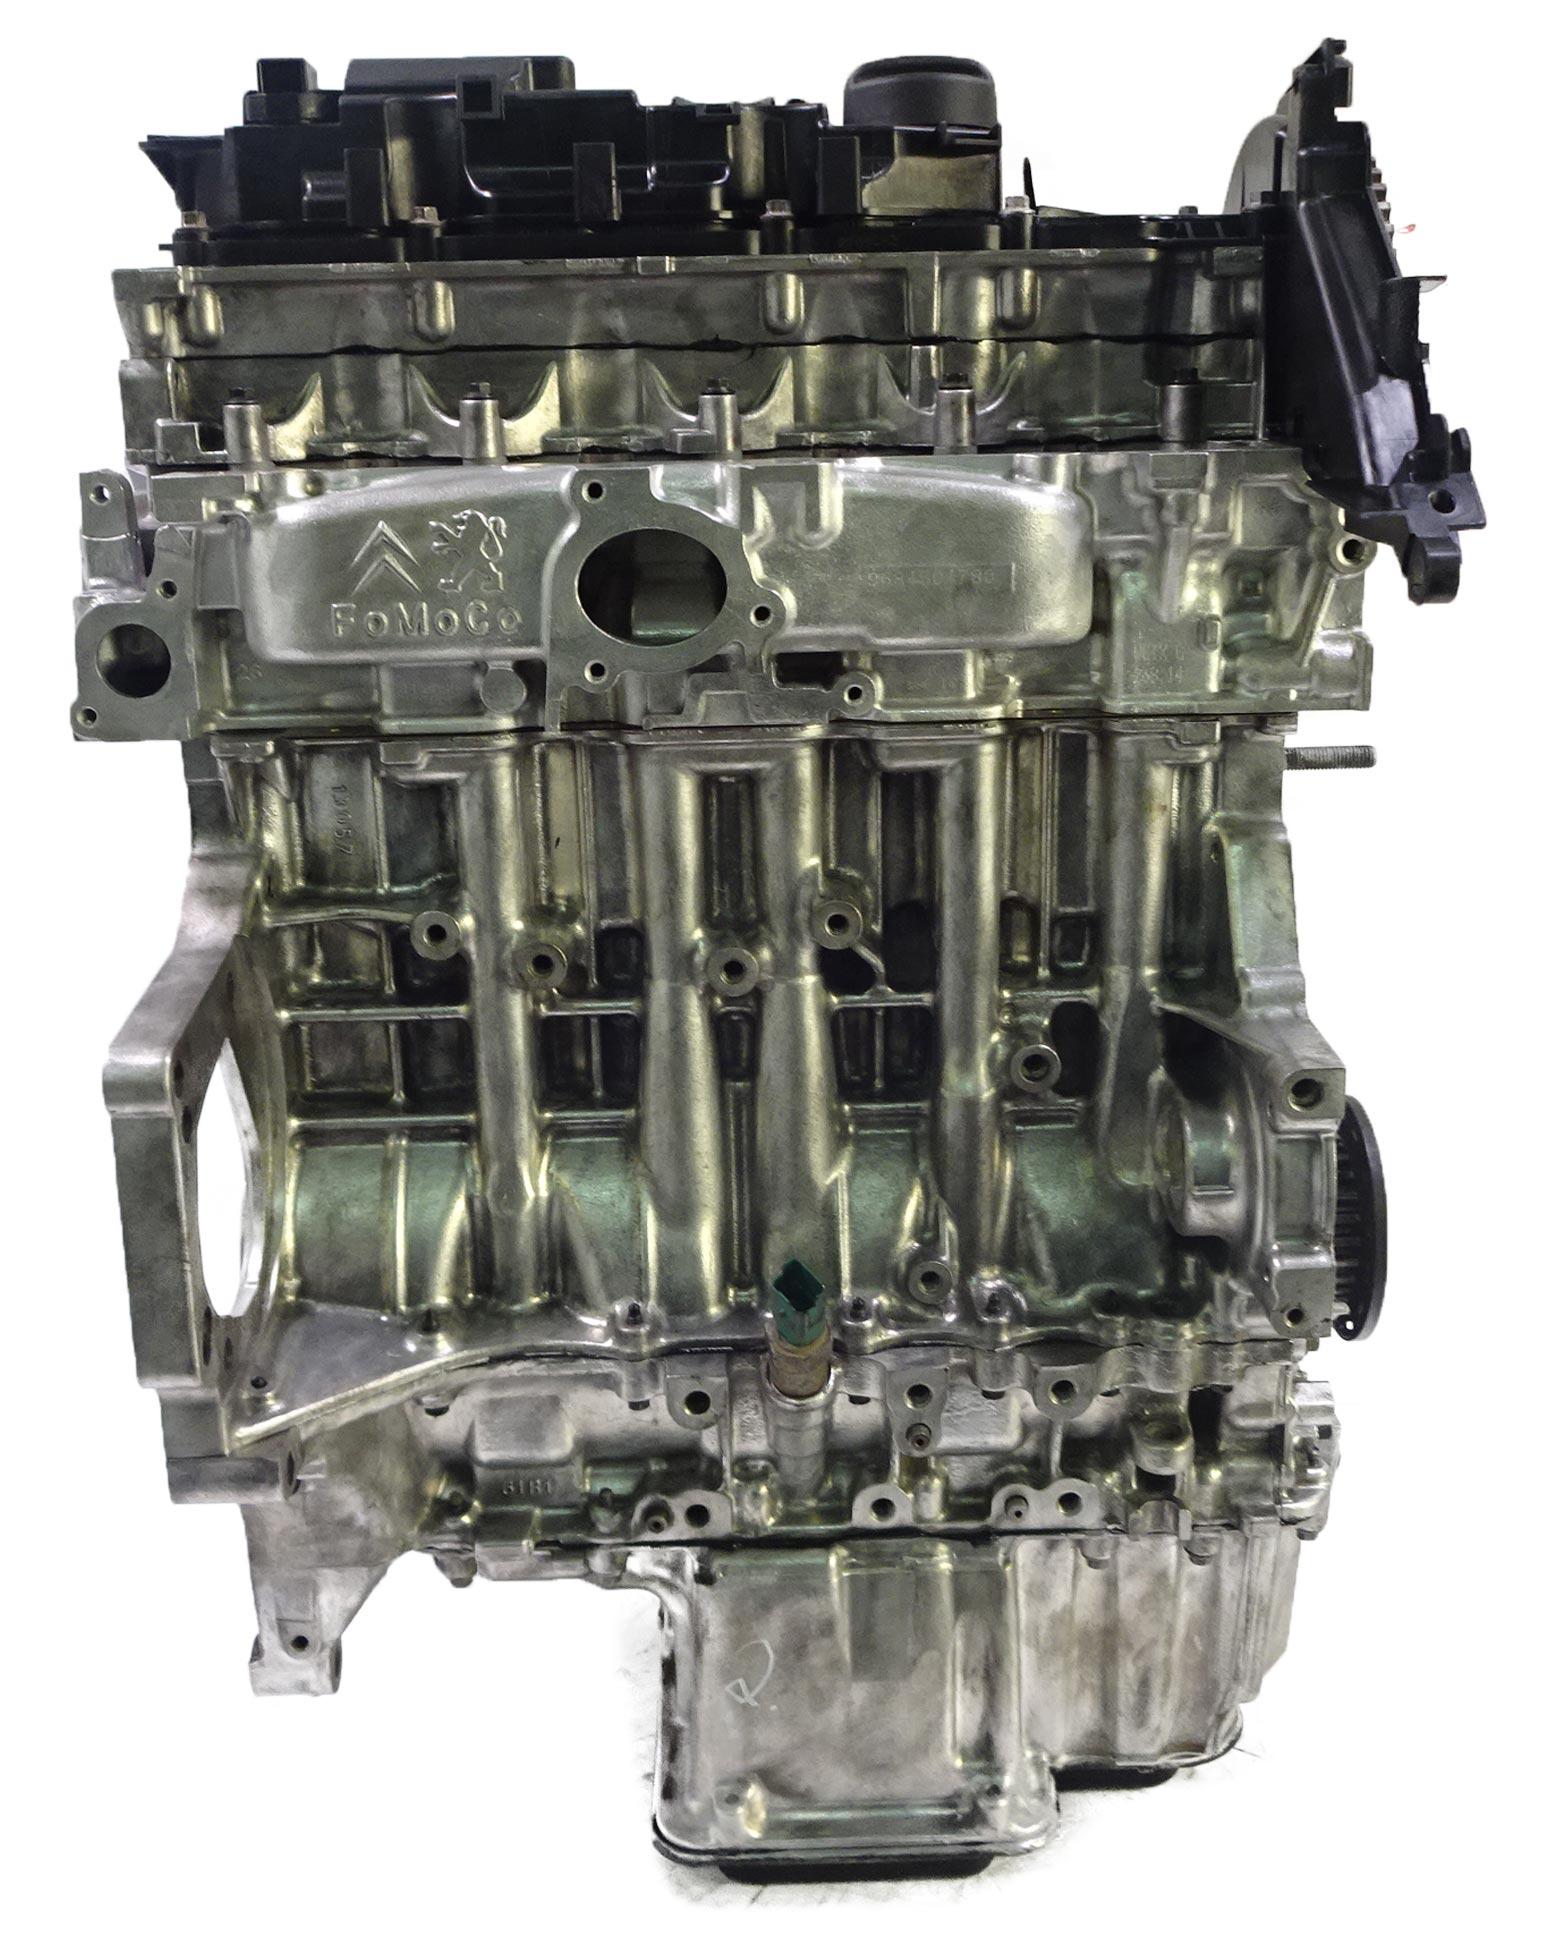 Motor 2012 Fiat 1,6 D Multijet 9H07 DV6UC Kopf geplant Dichtung NEU